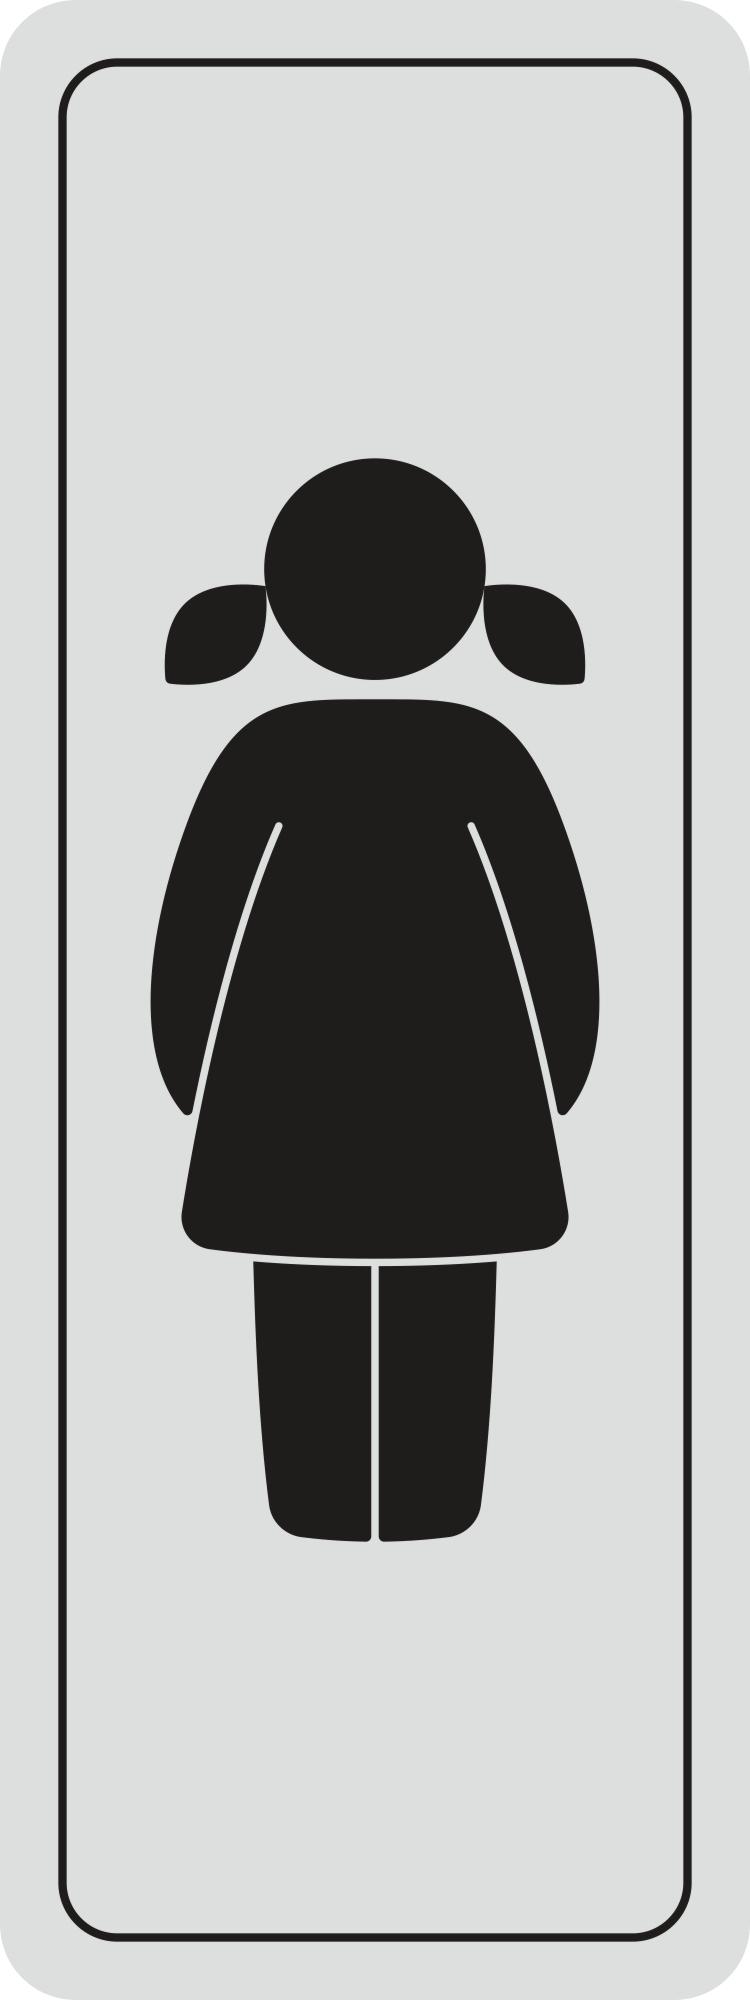 Türschild Frau selbstklebend 120 x 45 mm – Bild 1